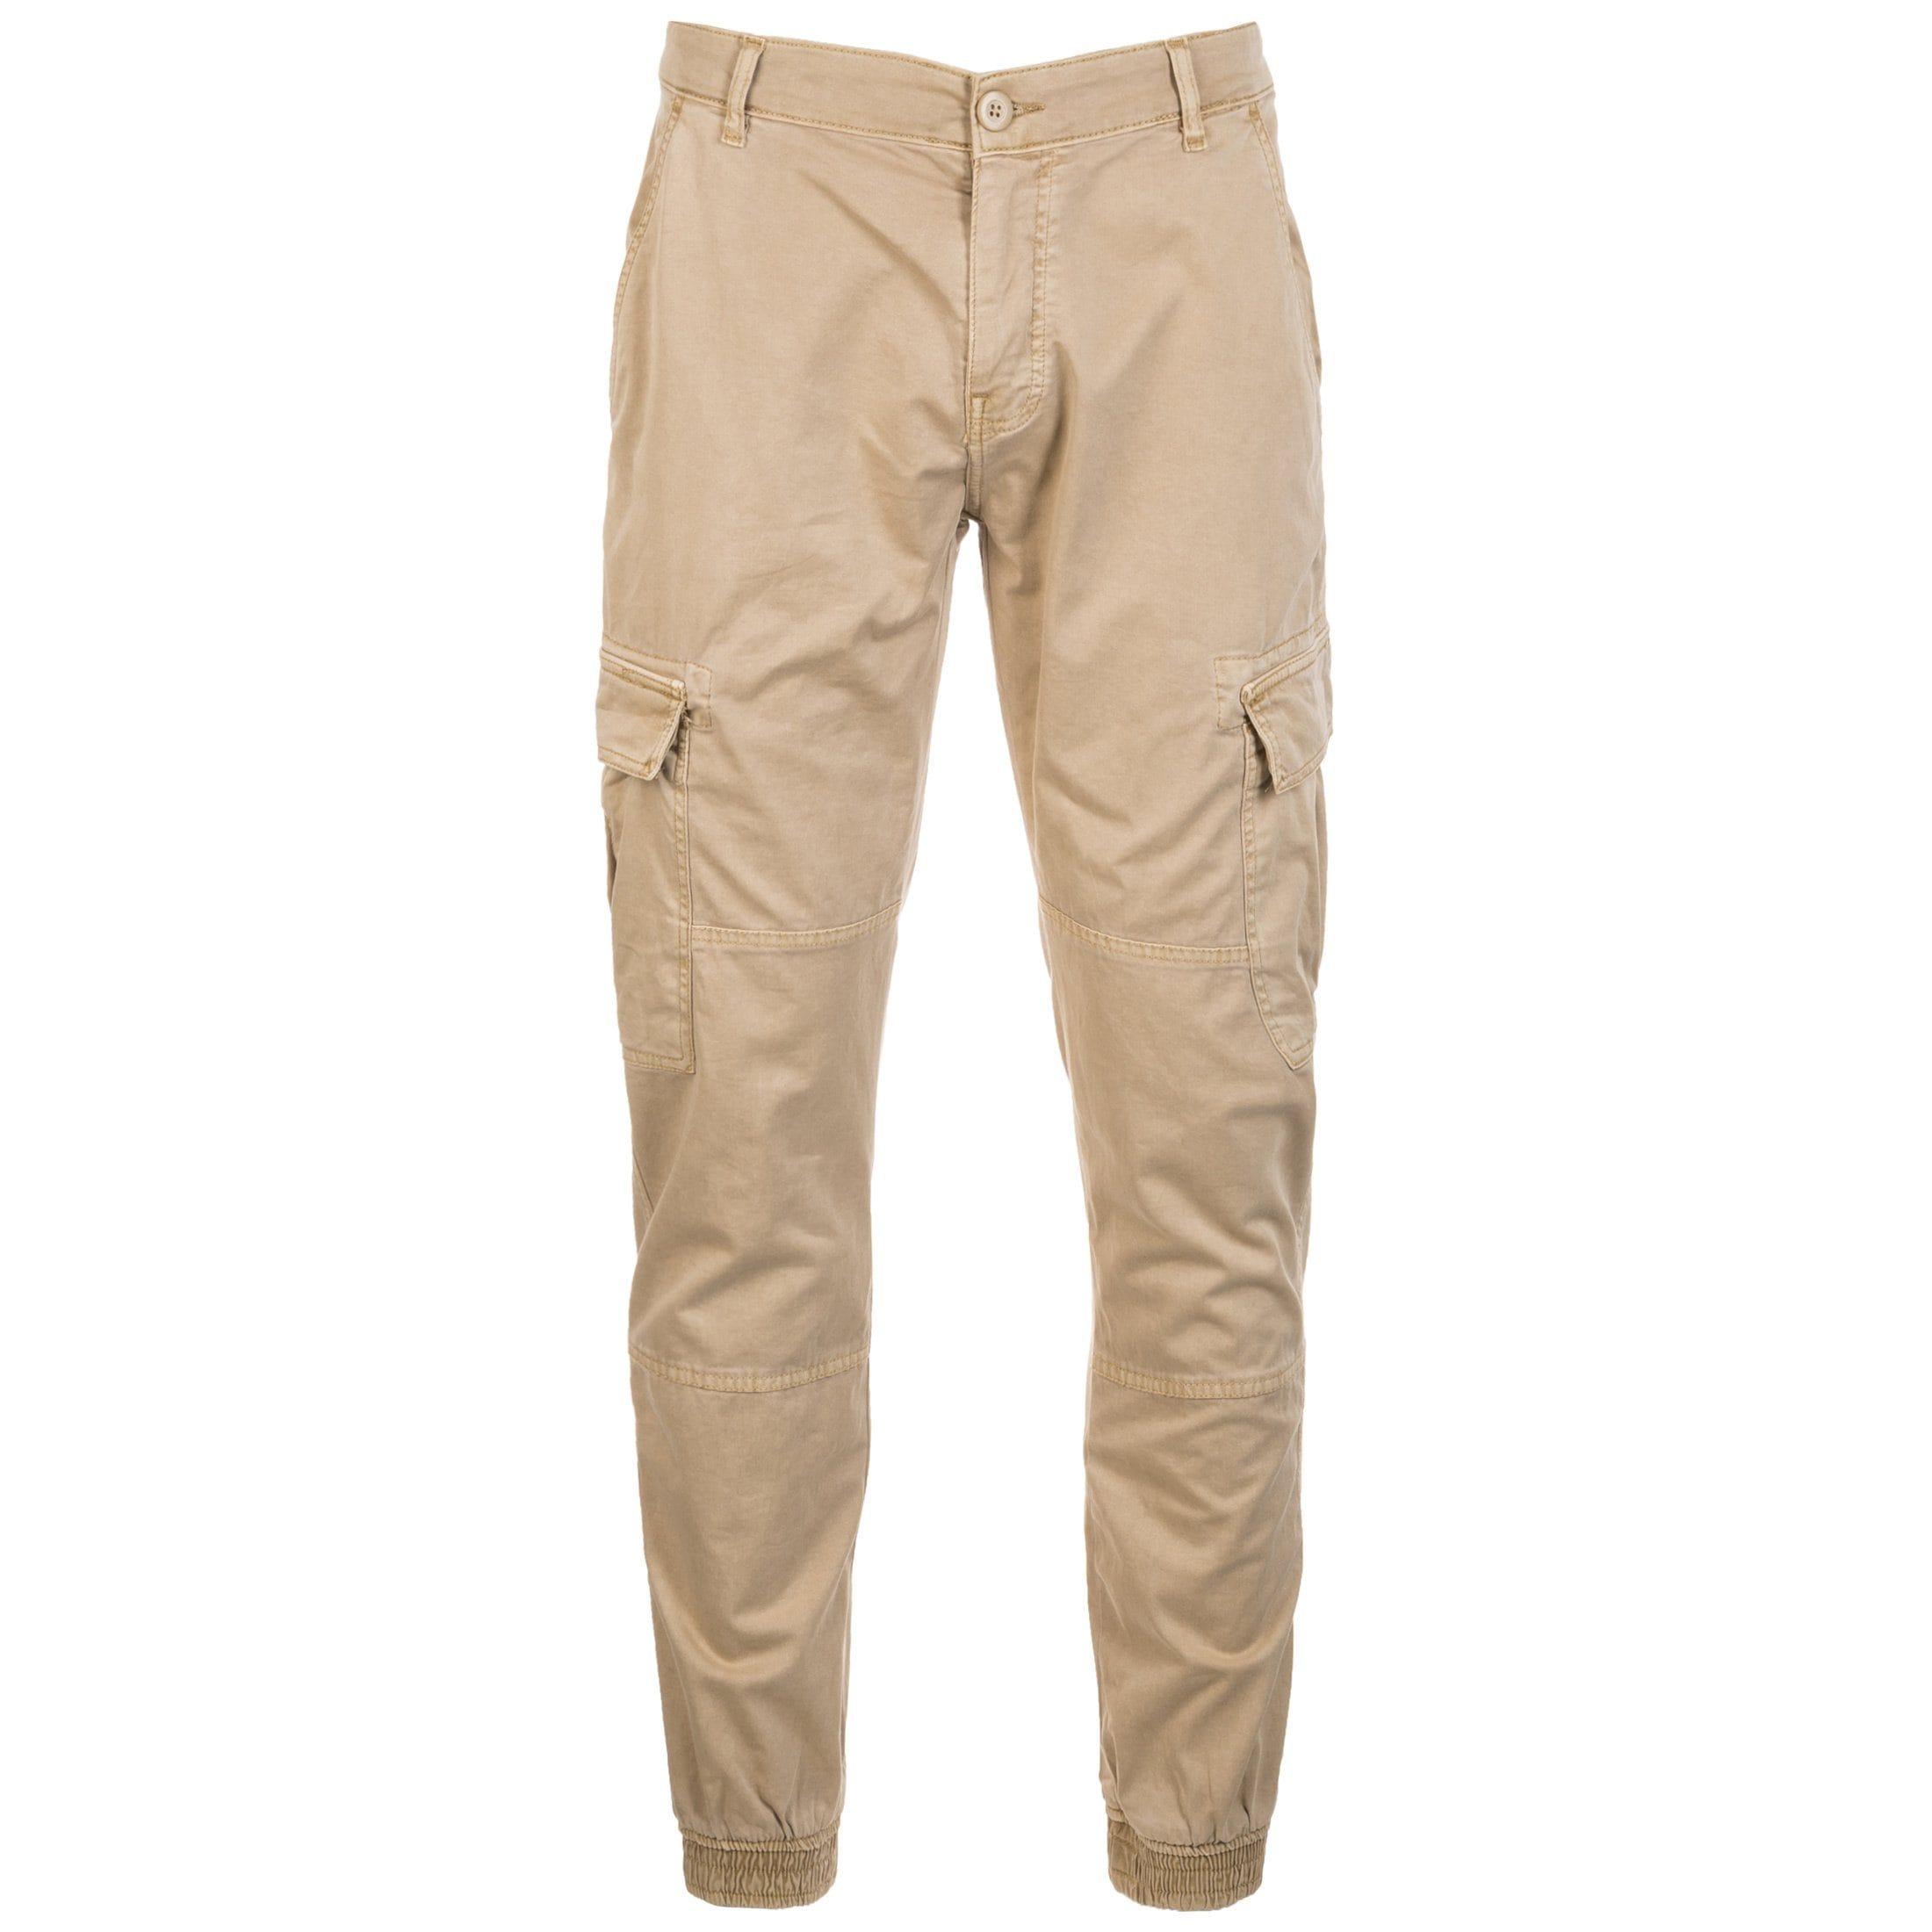 URBAN CLASSICS Jogginghose Washed Cargo Twill   Sportbekleidung > Sporthosen > Jogginghosen   Ab   Urban Classics